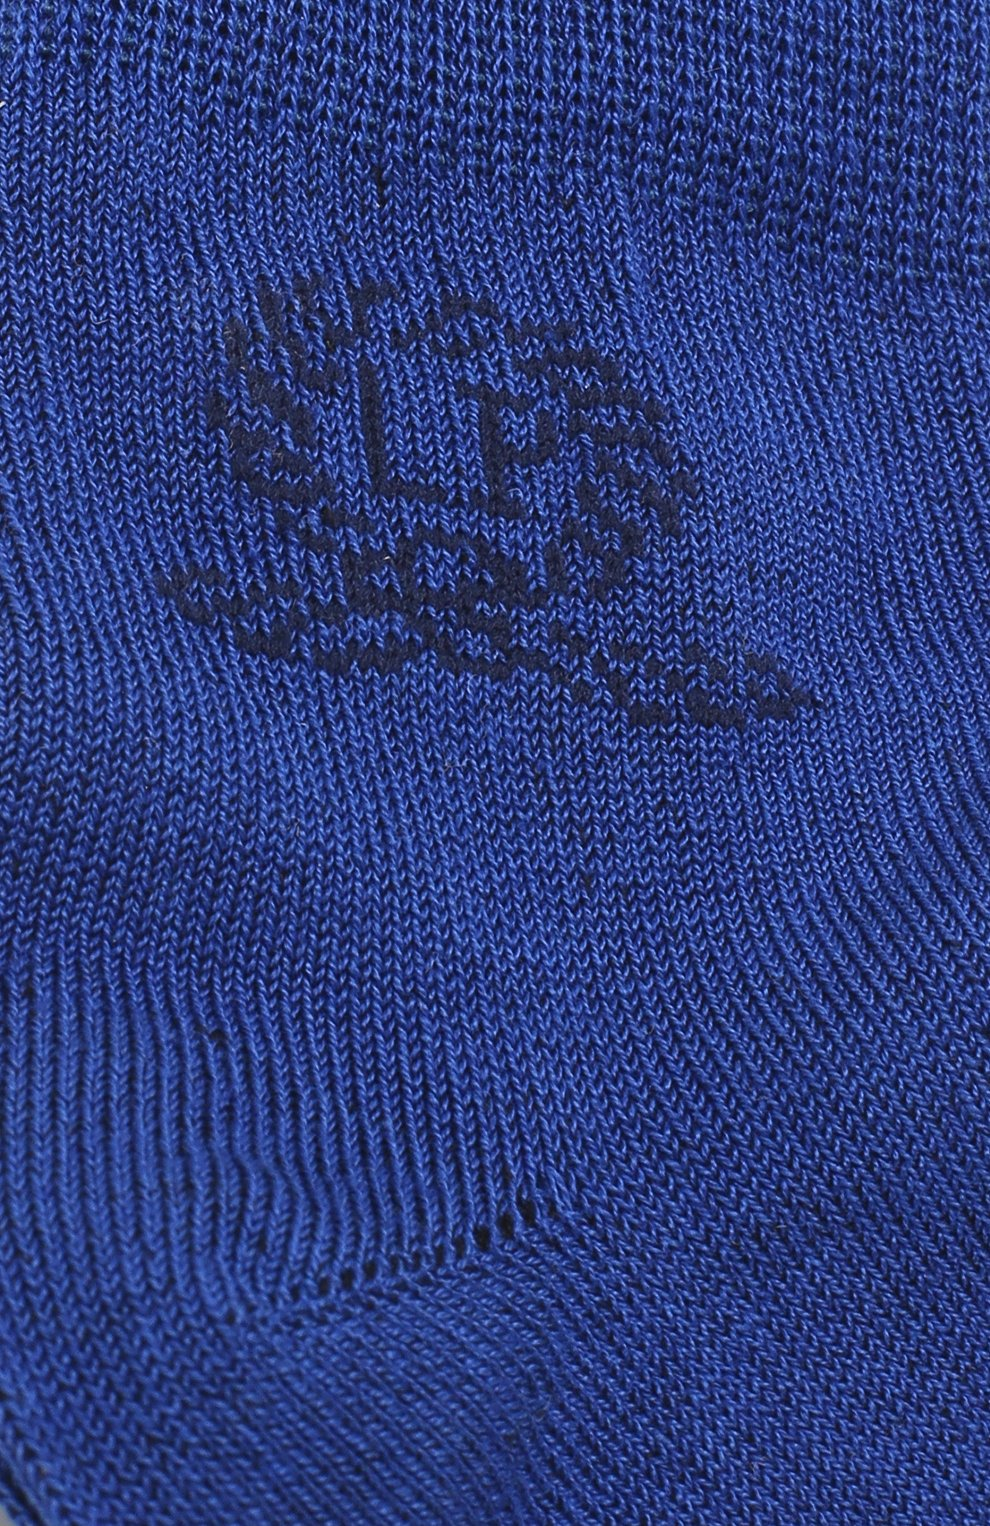 Детские носки с логотипом бренда La Perla синего цвета | Фото №2